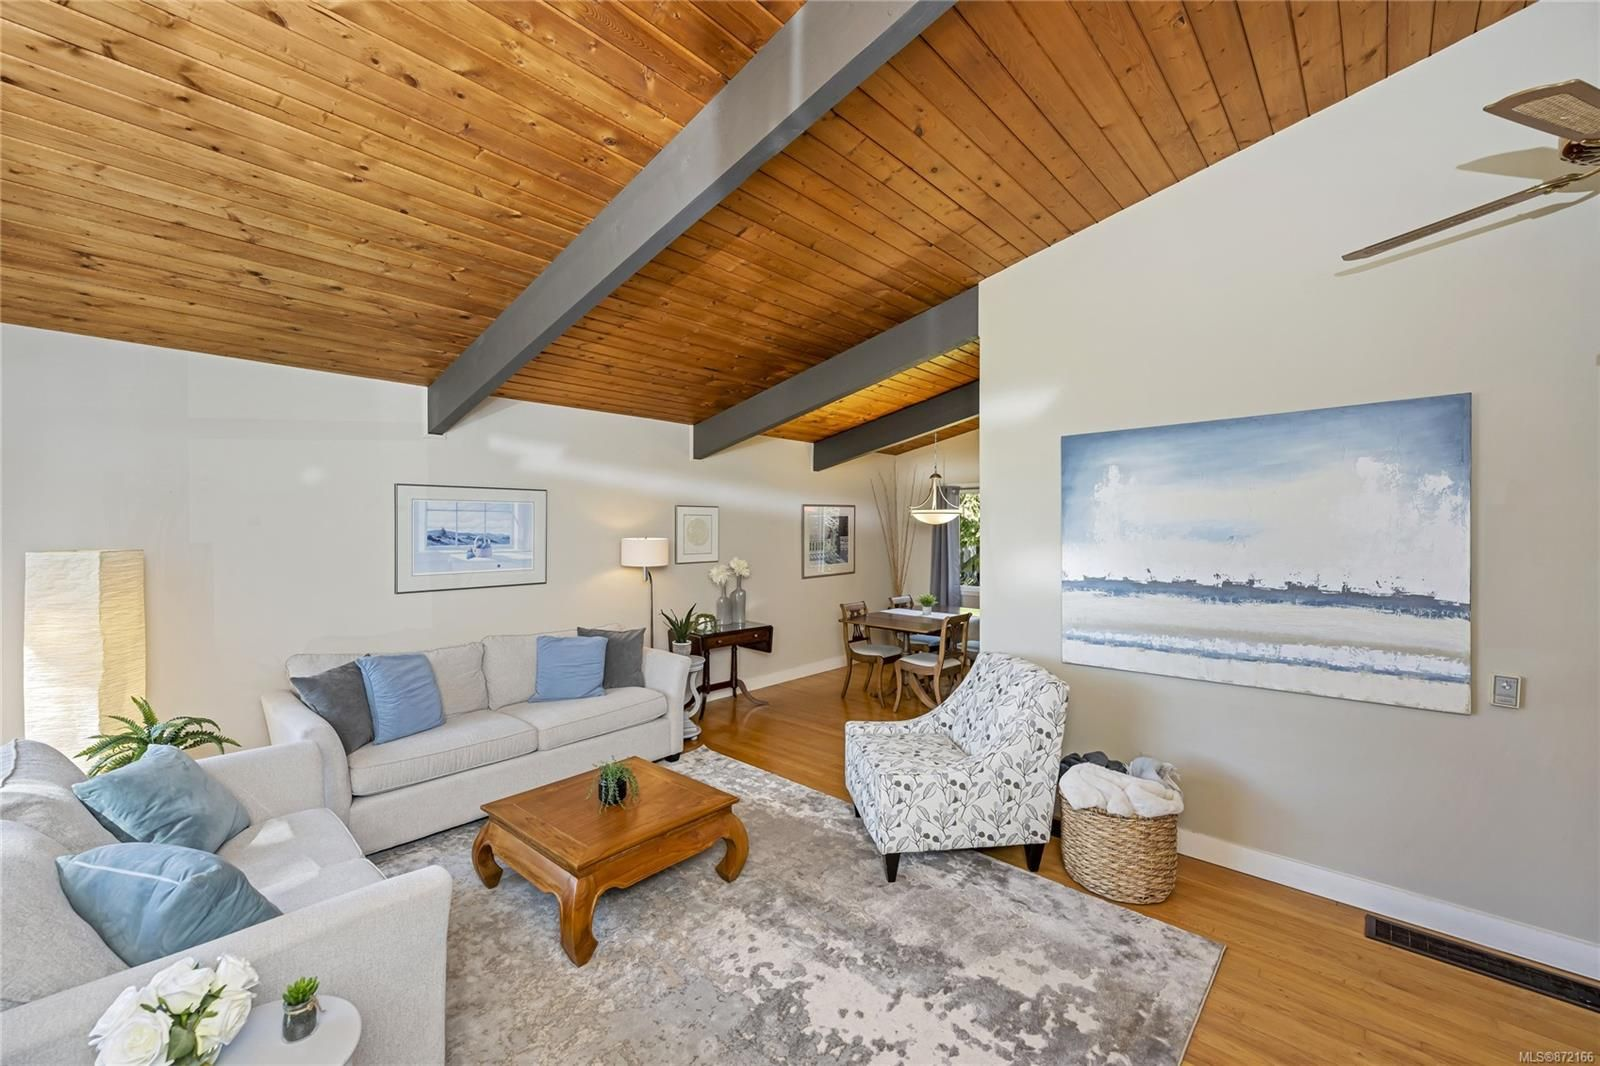 Photo 3: Photos: 1690 Blair Ave in : SE Lambrick Park House for sale (Saanich East)  : MLS®# 872166